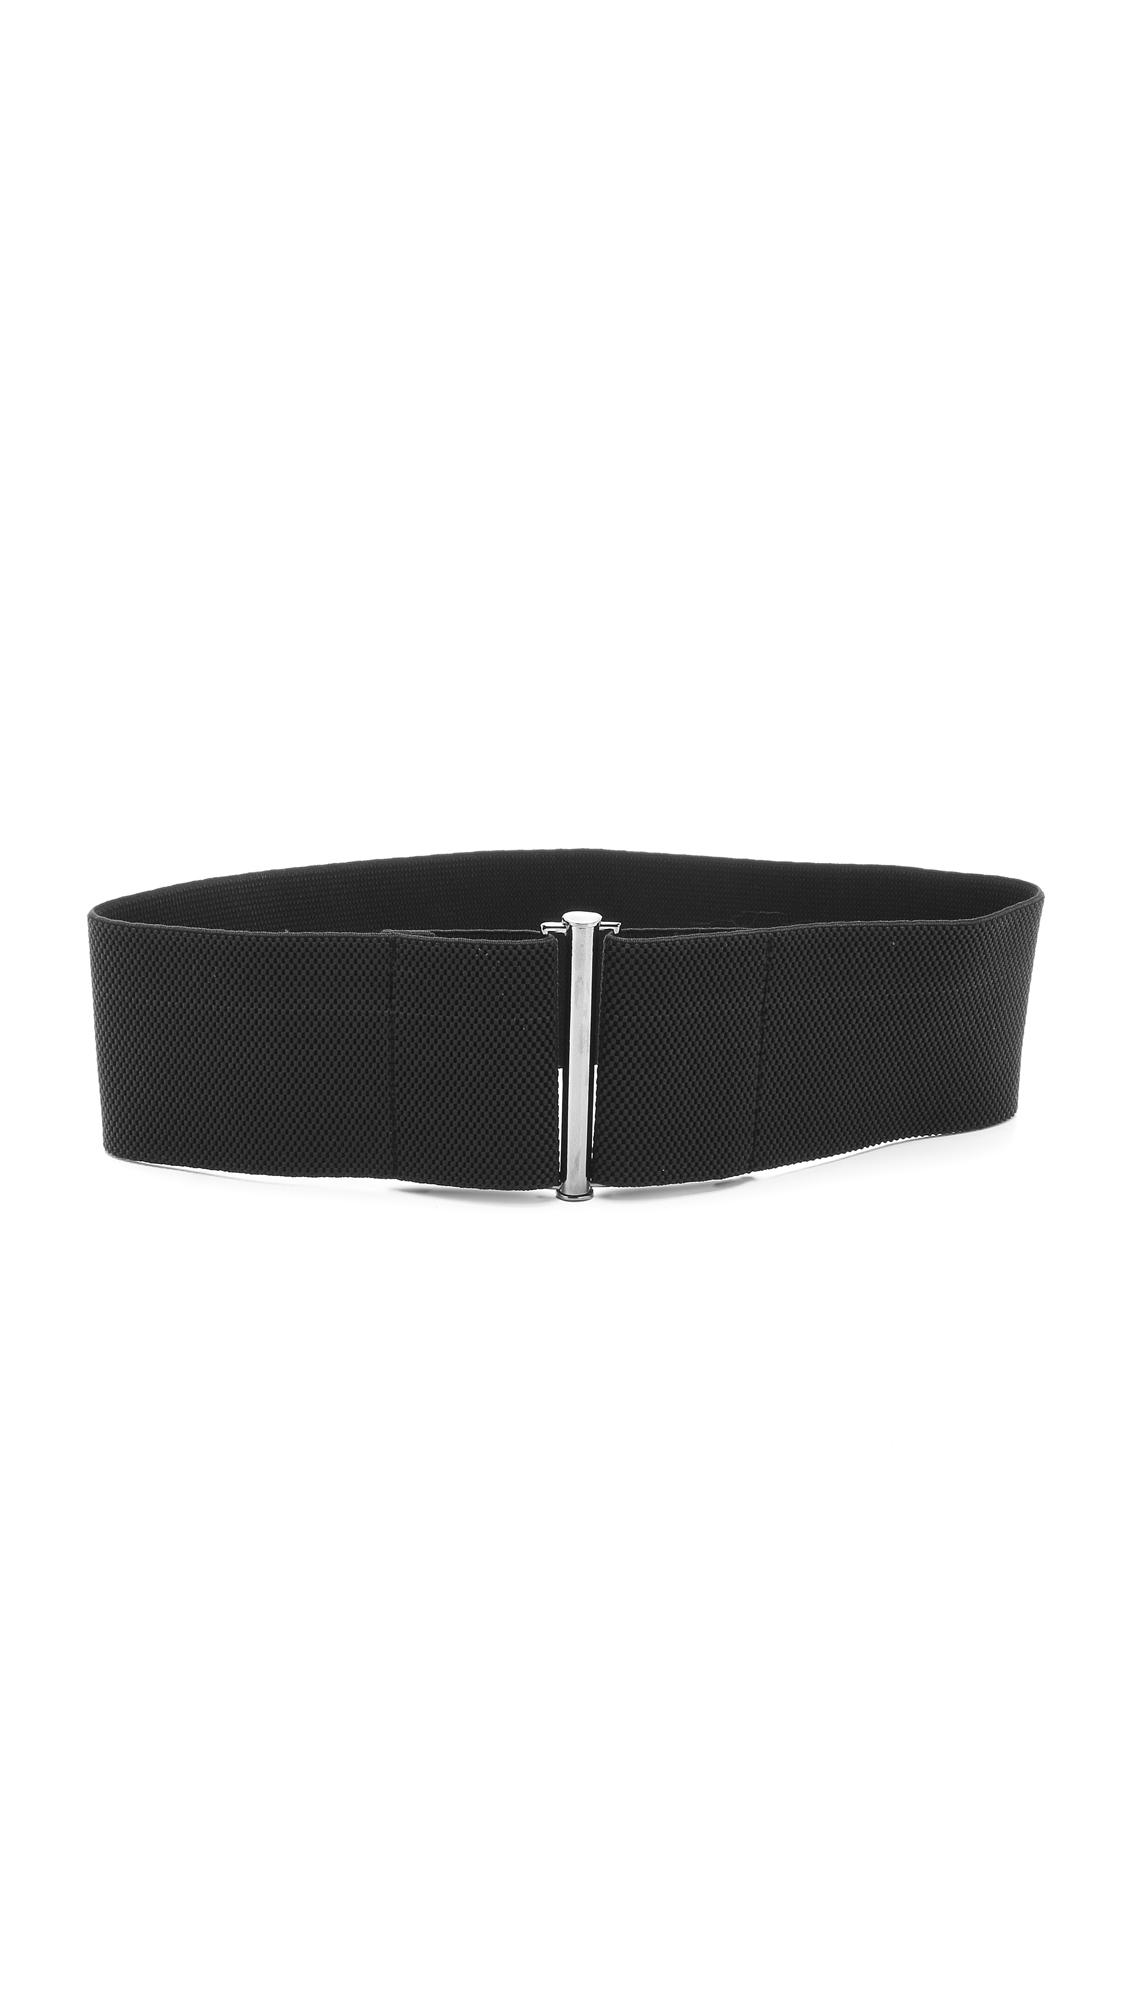 Zero + Maria Cornejo All Elastic Zumi Belt - Black at Shopbop